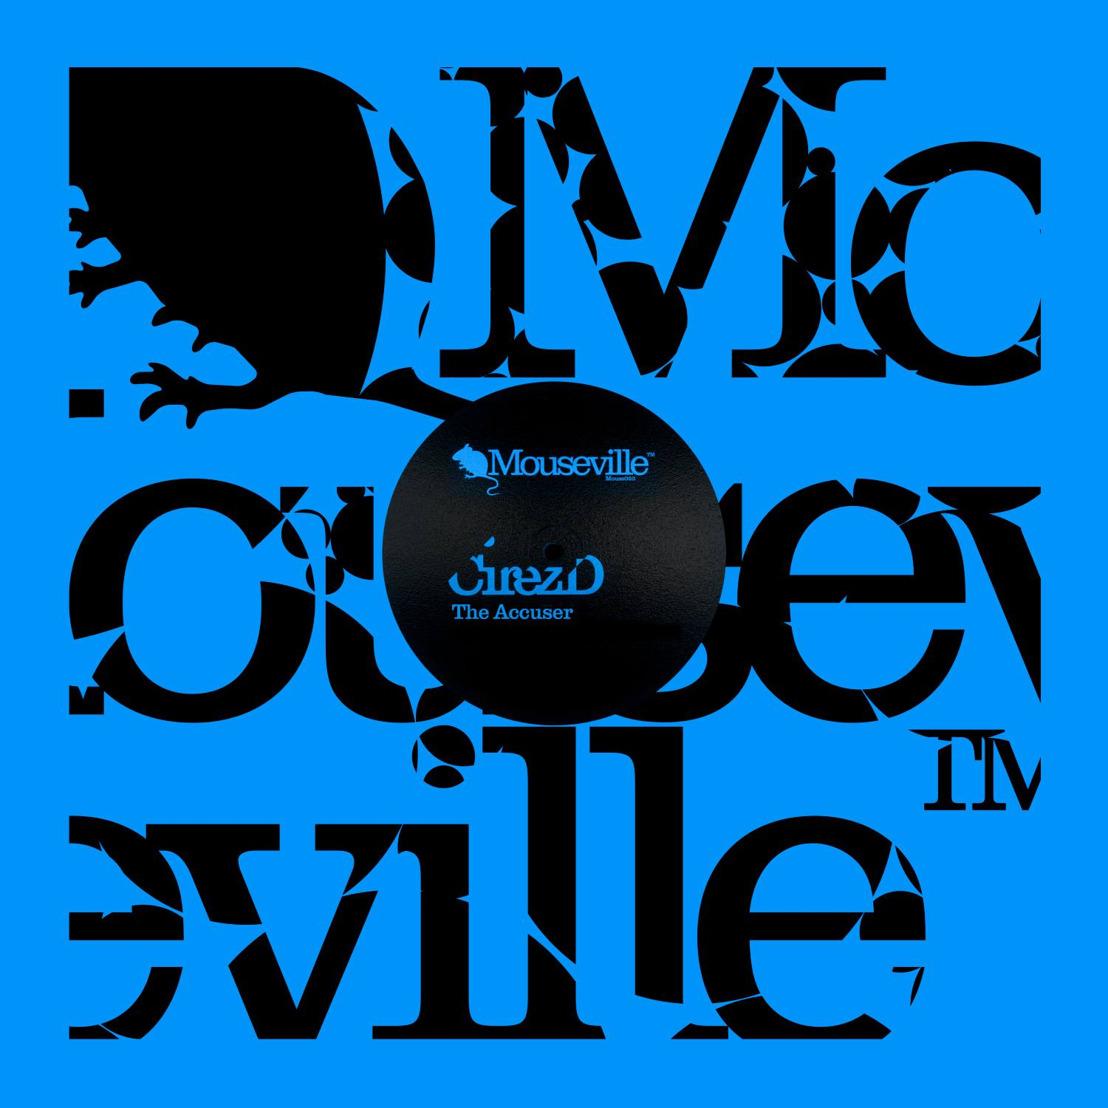 Eric Prydz Releases New Track Under CirezD Moniker -